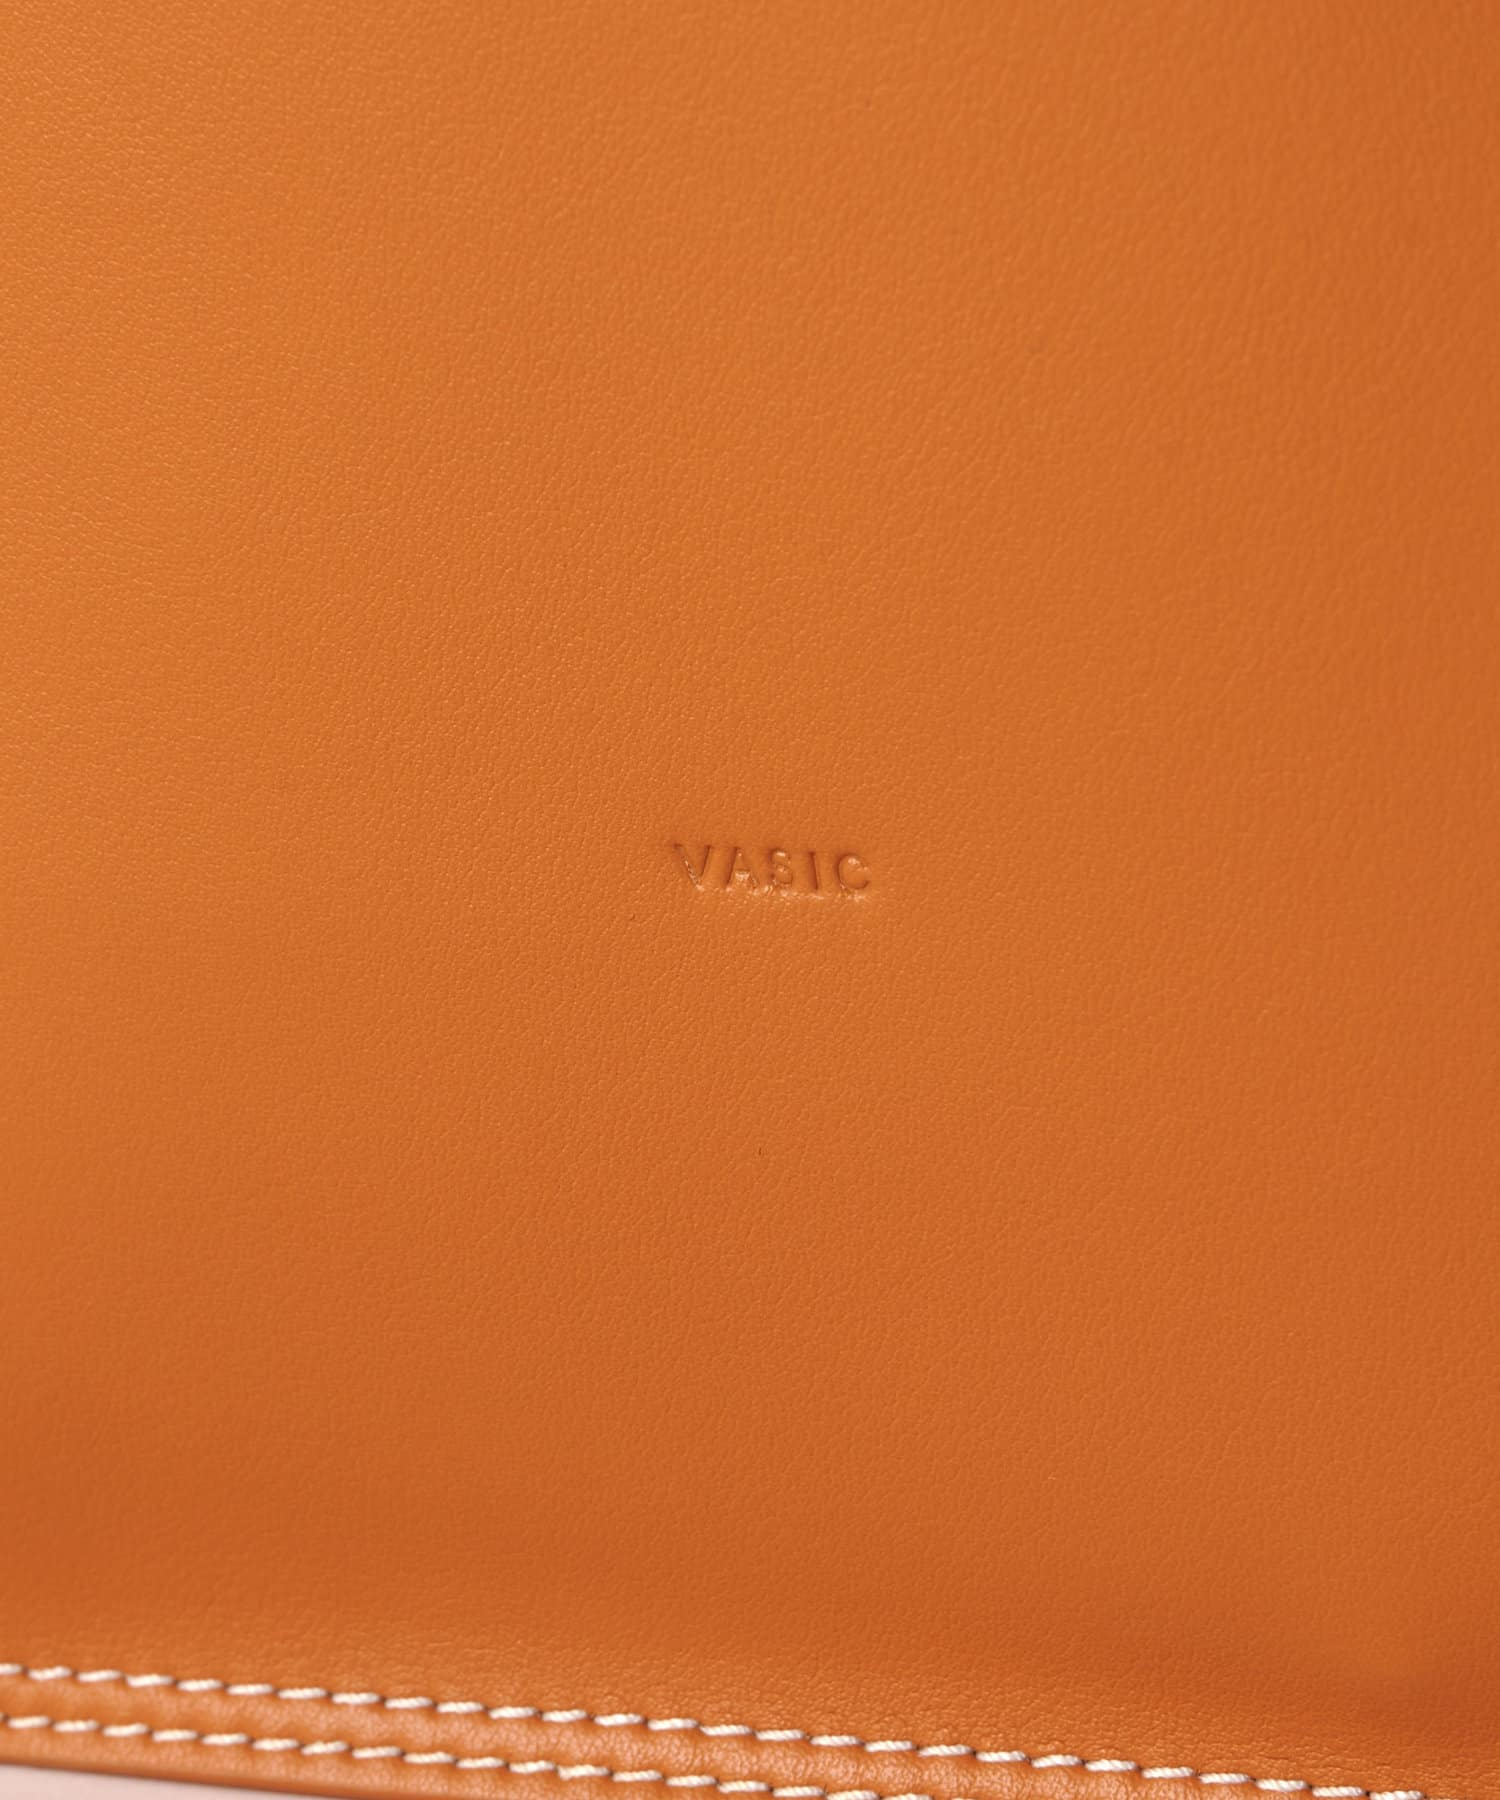 GALLARDAGALANTE(ガリャルダガランテ) 【VASIC】Sac Mini /トートバッグ